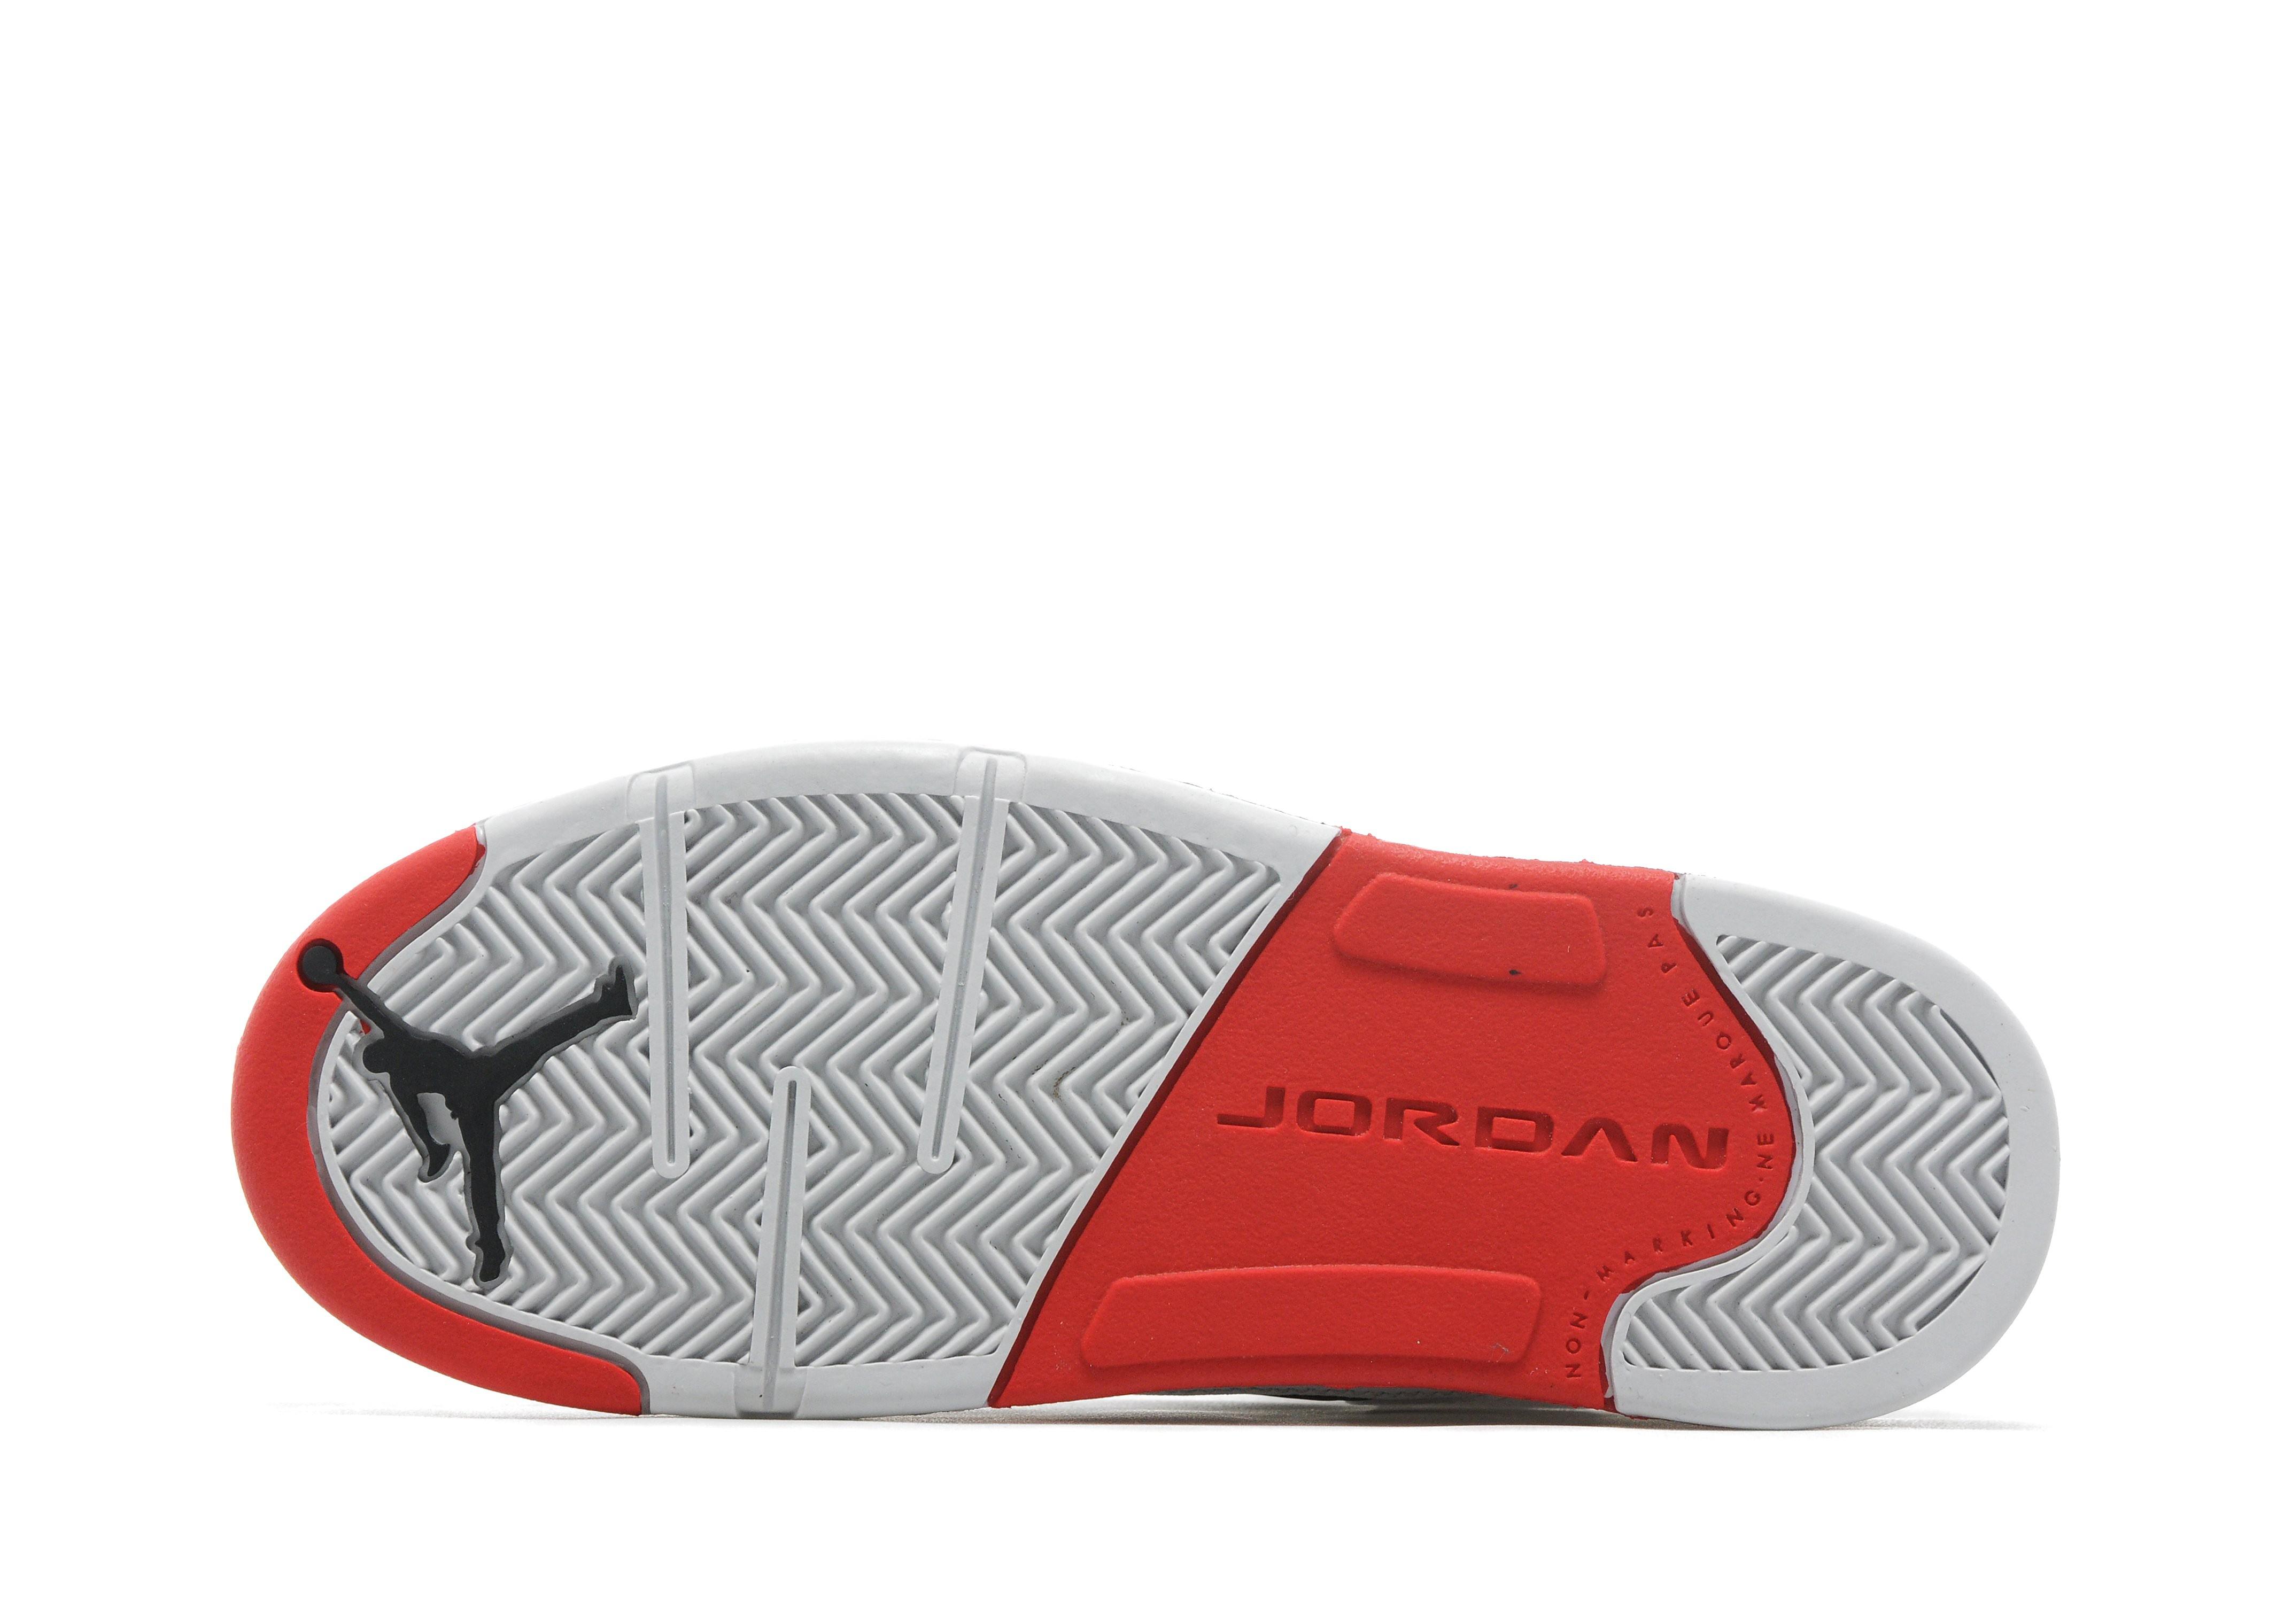 Jordan Air Retro V Low Children 'Fire Red'